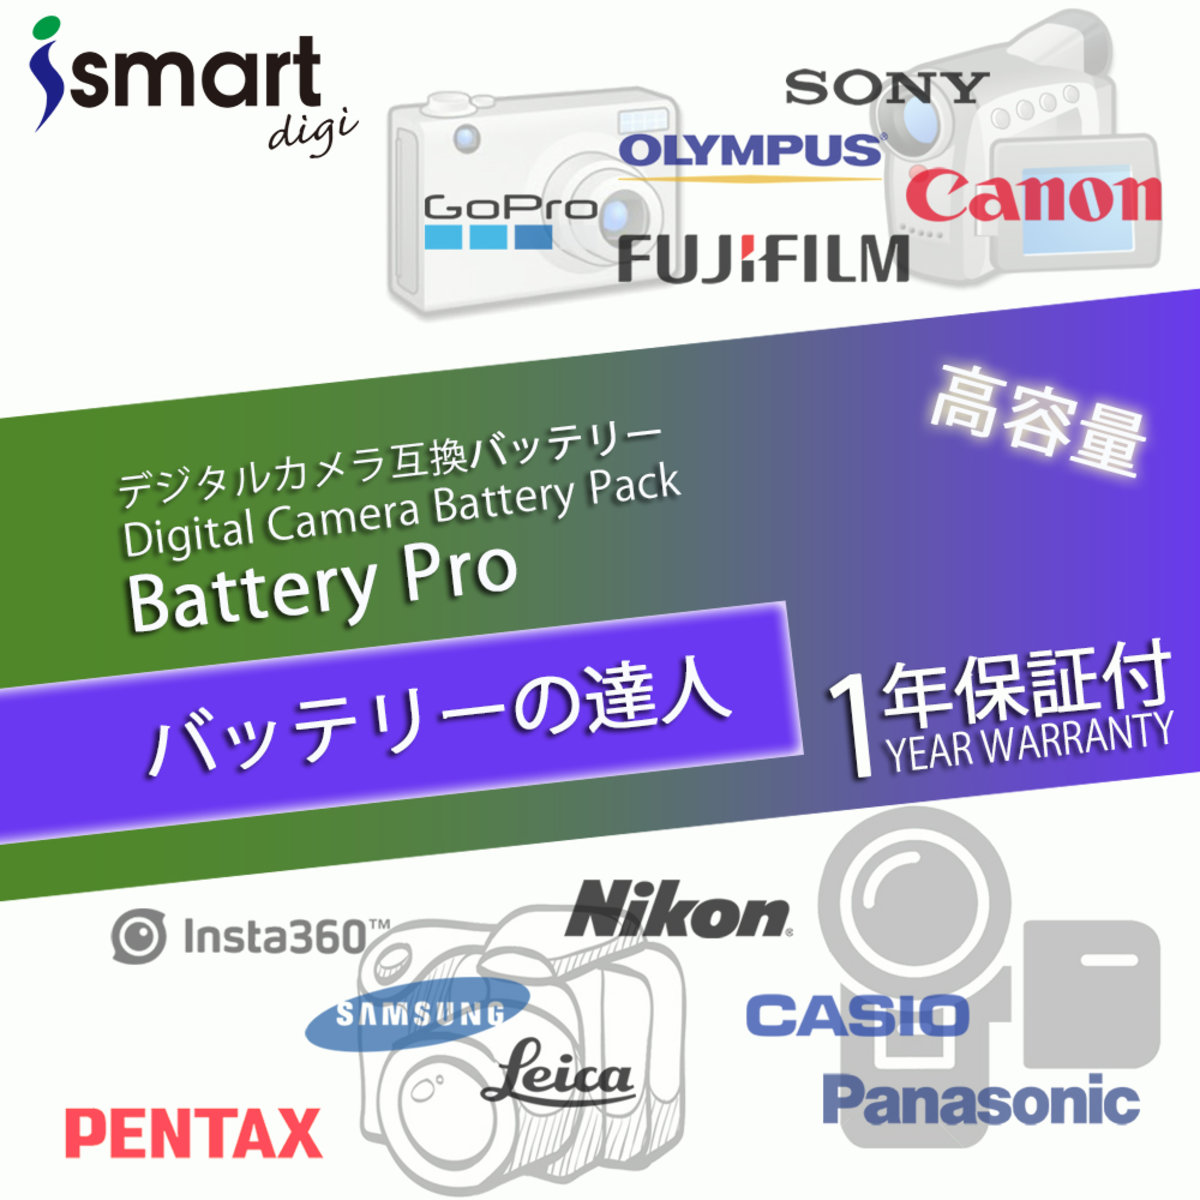 Canon Digital Camera Battery (For: HF100, HF11, HG21,VIXIA HF10, HF100, iVIS HF10, HF100)